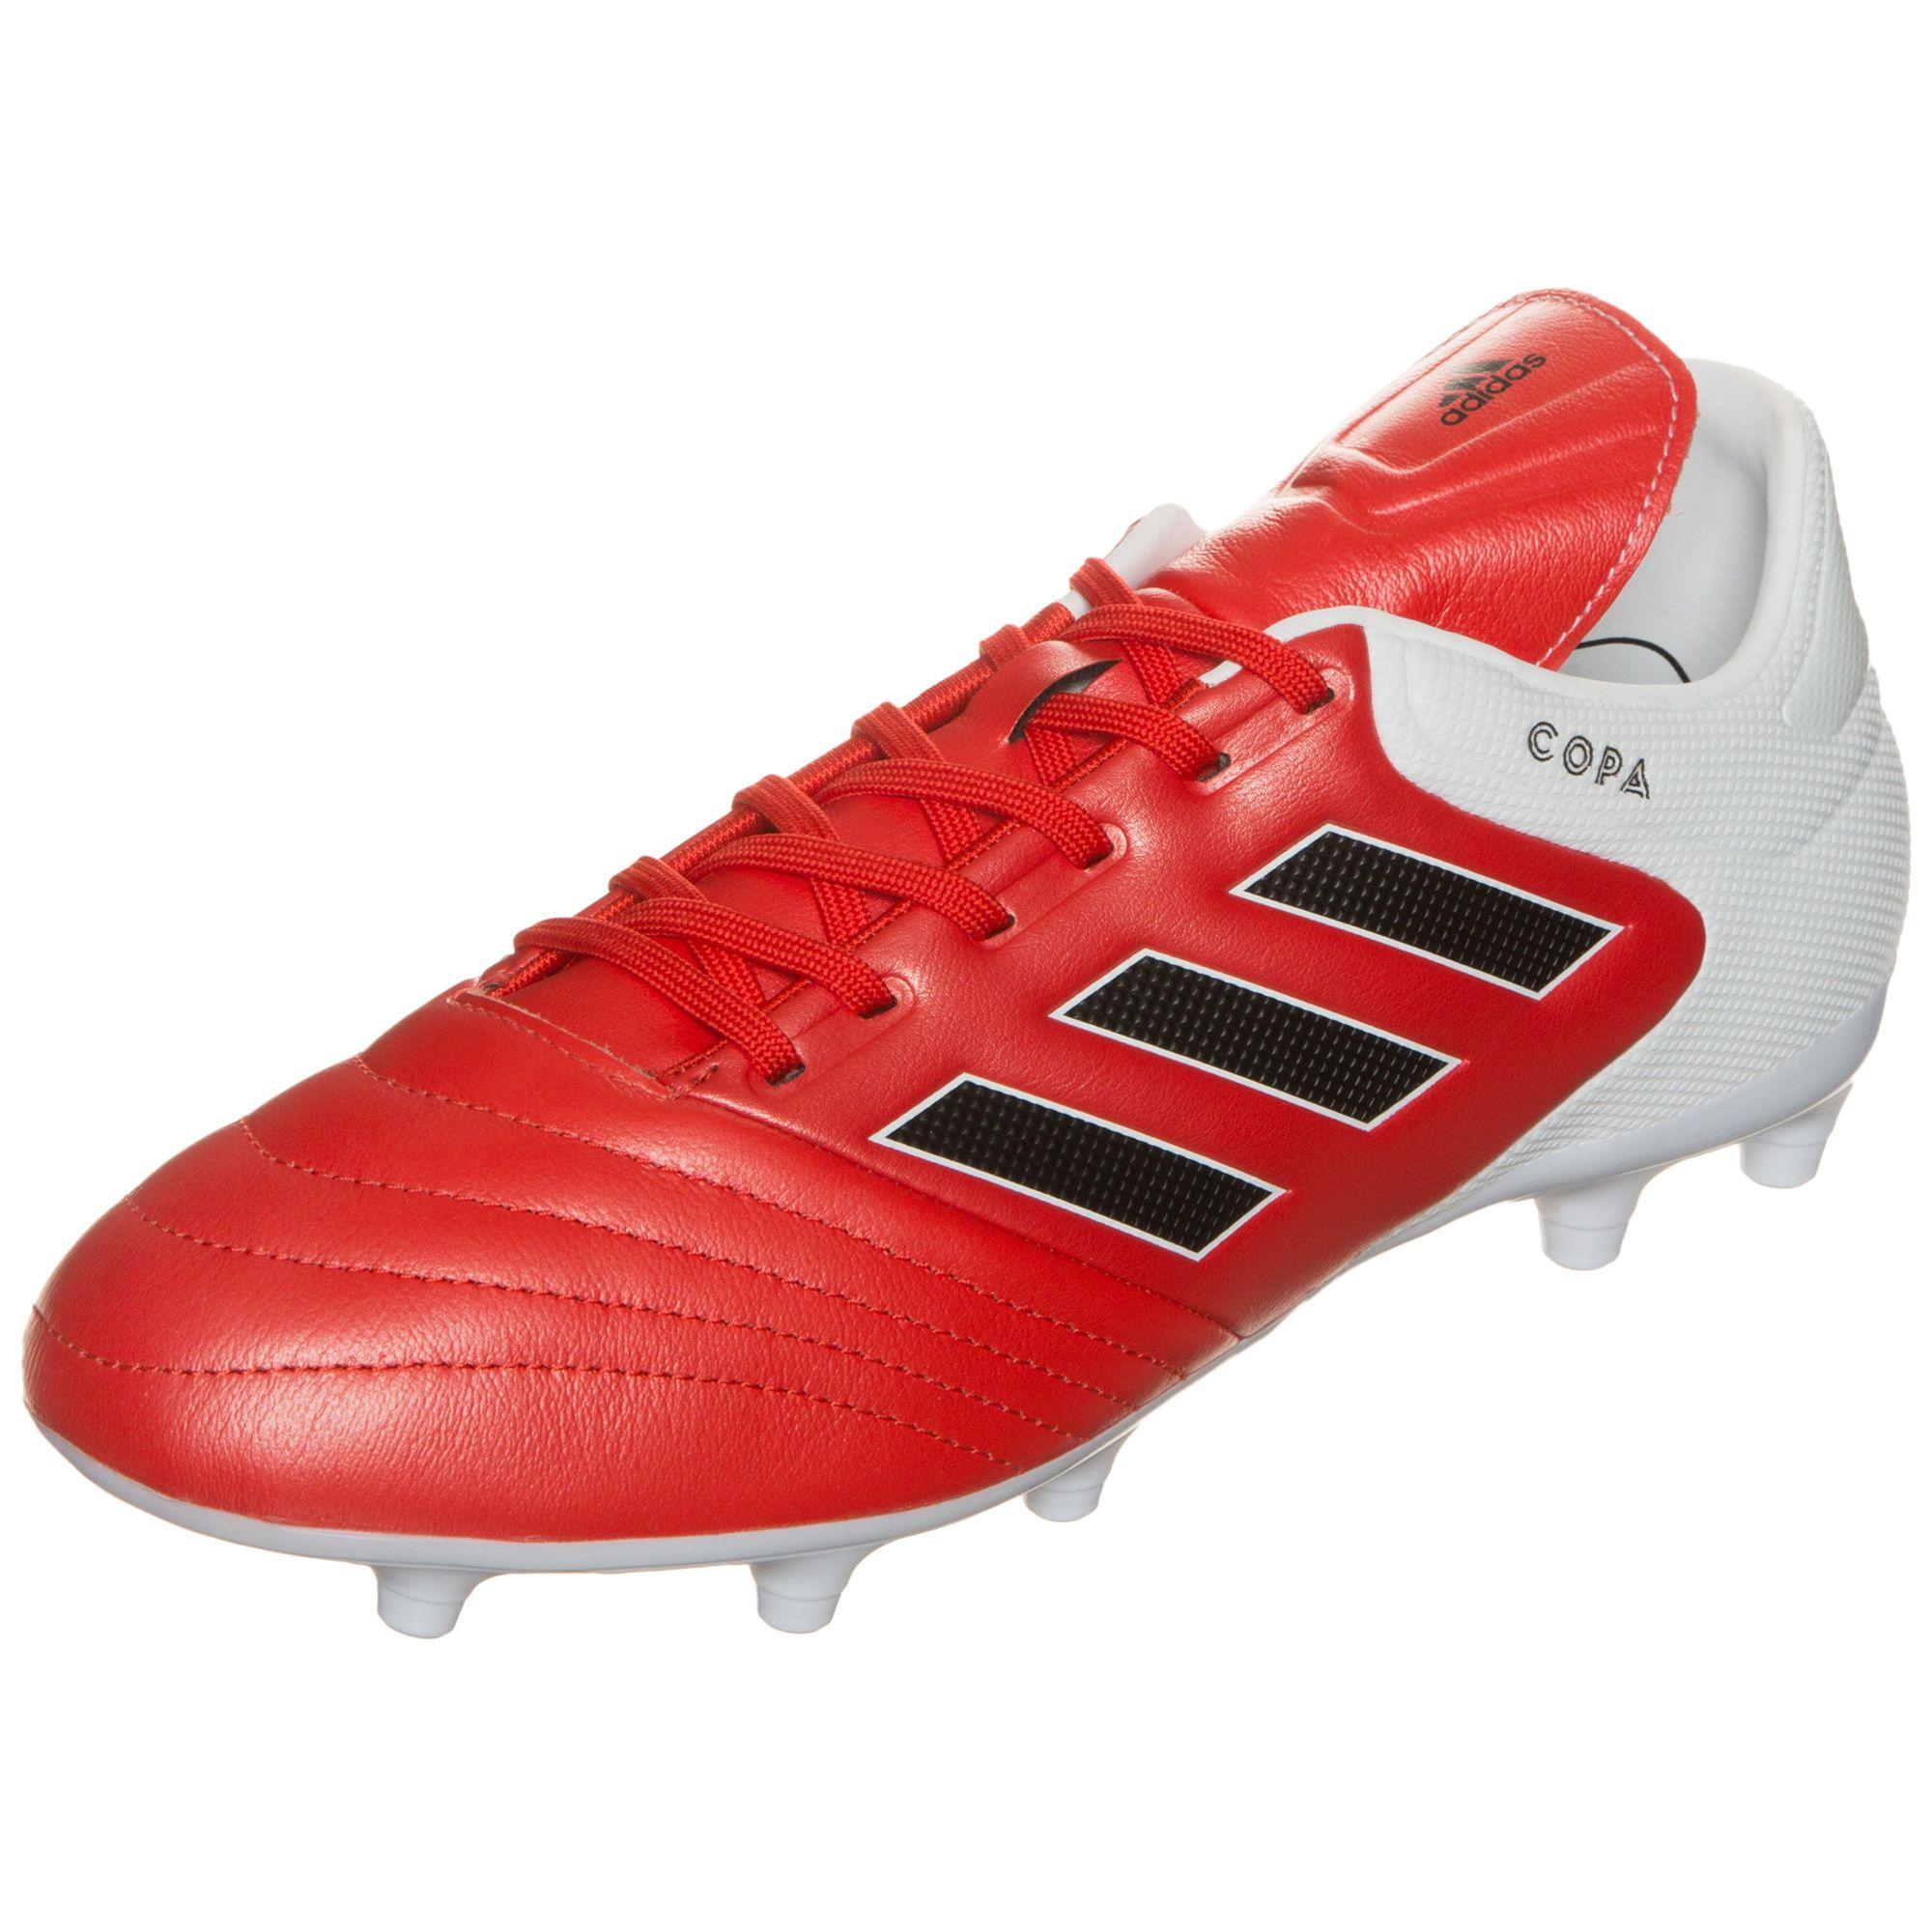 ADIDAS PERFORMANCE adidas Performance Copa 17.3 FG Fußballschuh Herren